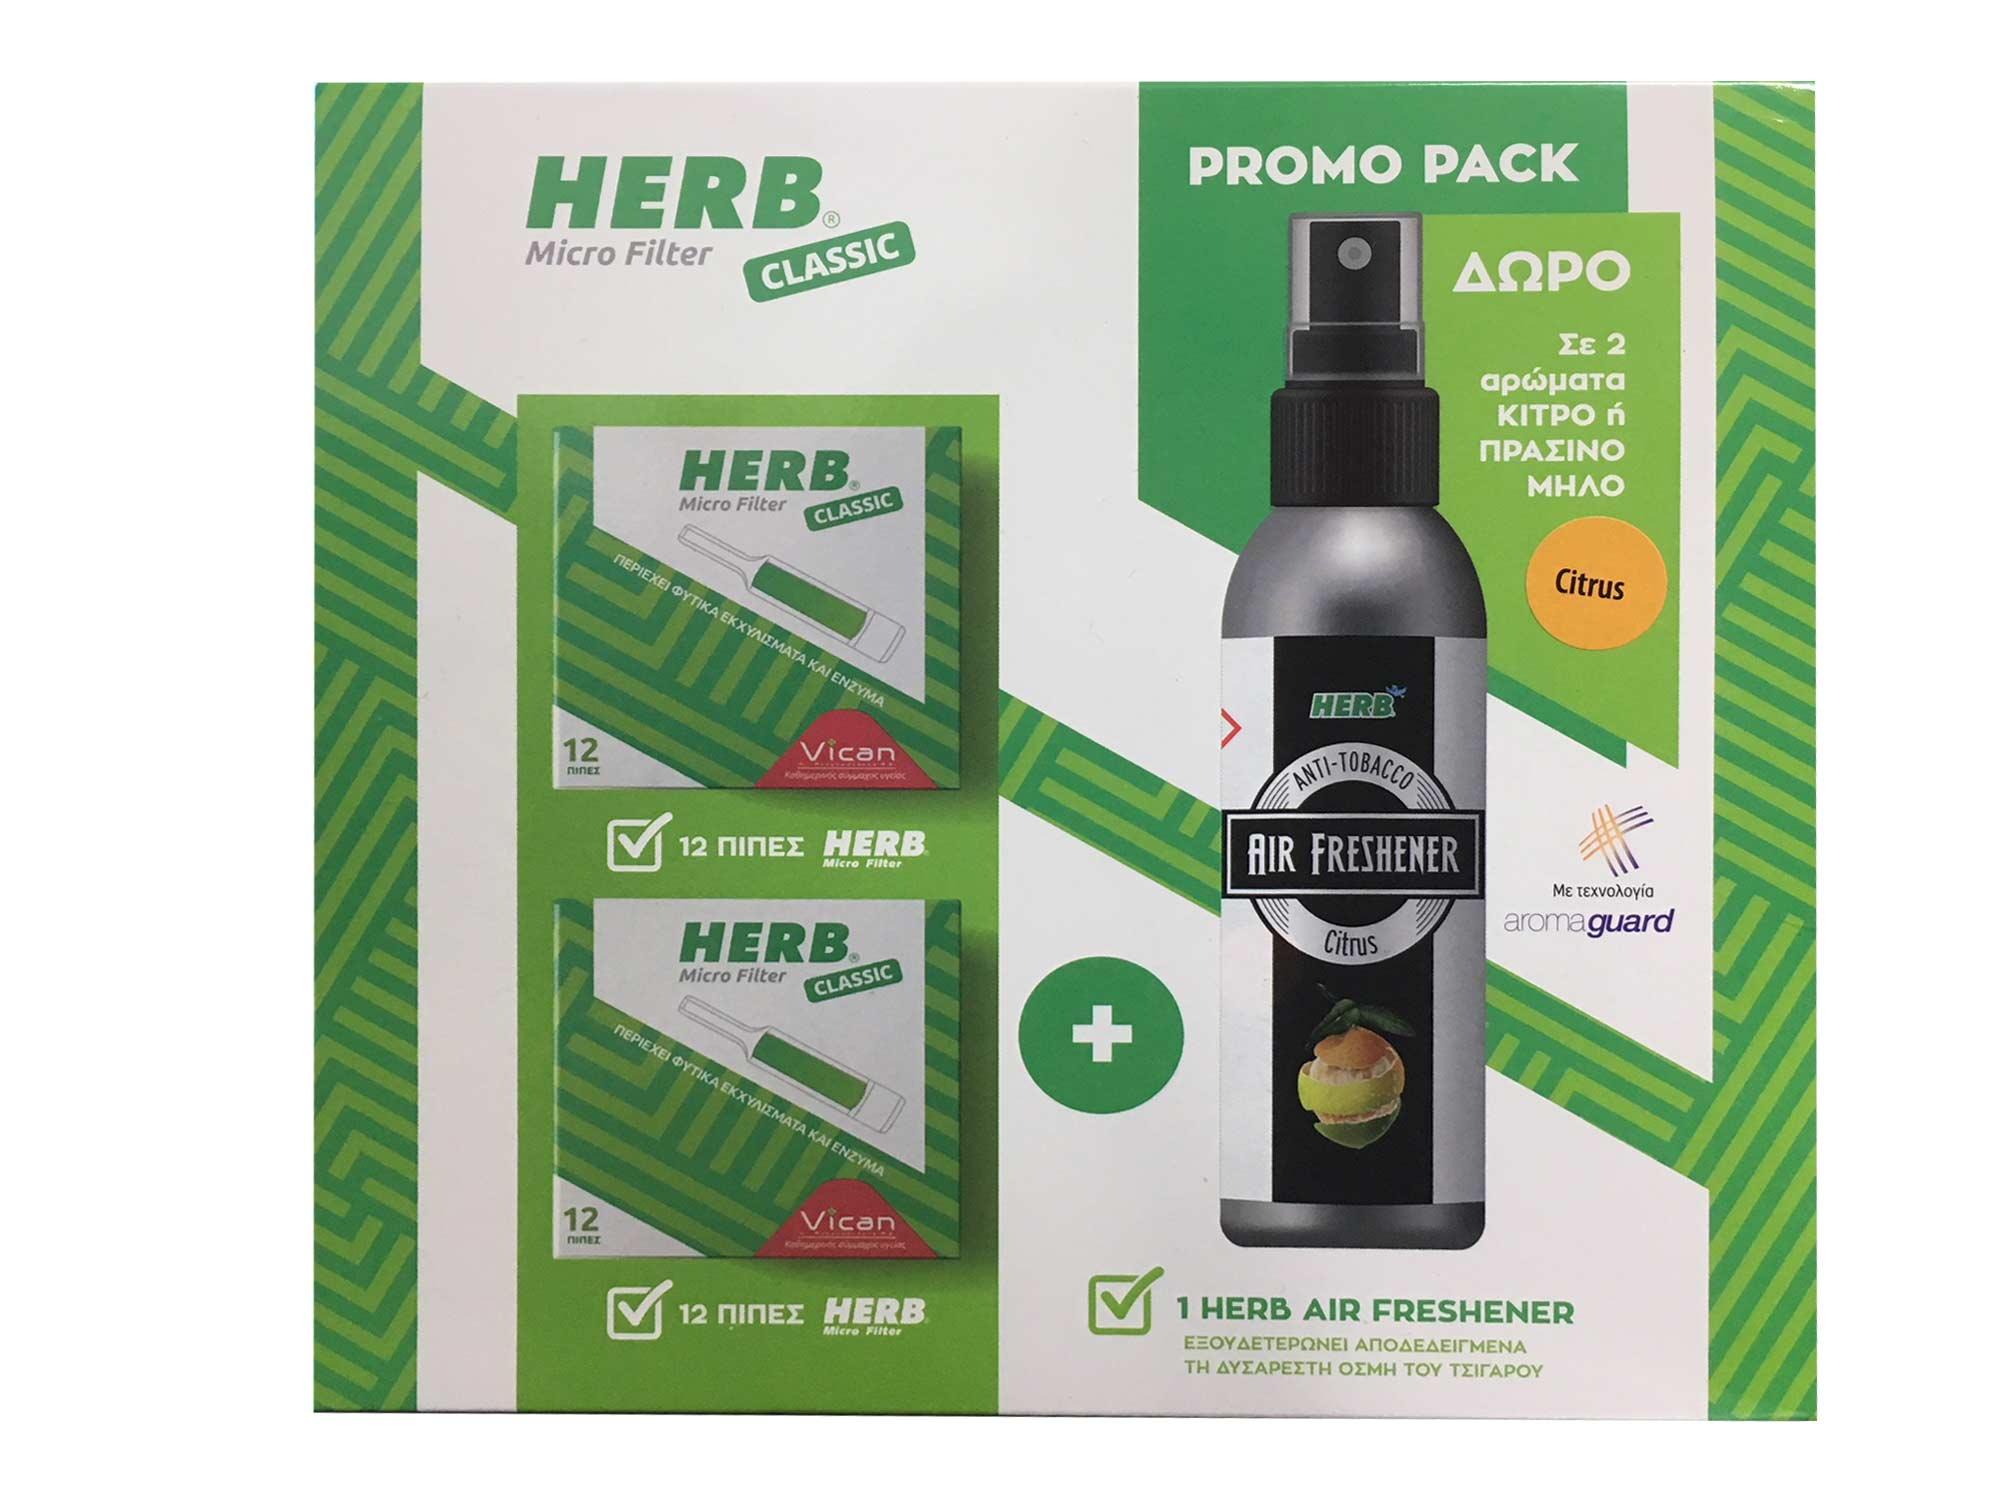 Herb Πίπες PROMO PACK με Micro Filter Ανταλλακτικά Φίλτρα για Κανονικό Τσιγάρο, 2 x 12 τεμάχια & ΔΩΡΟ Herb Air Freshener Αποσμητικό Χώρου που εξουδετερώνει την Οσμή του Τσιγάρου με Άρωμα Κίτρο, 75ml